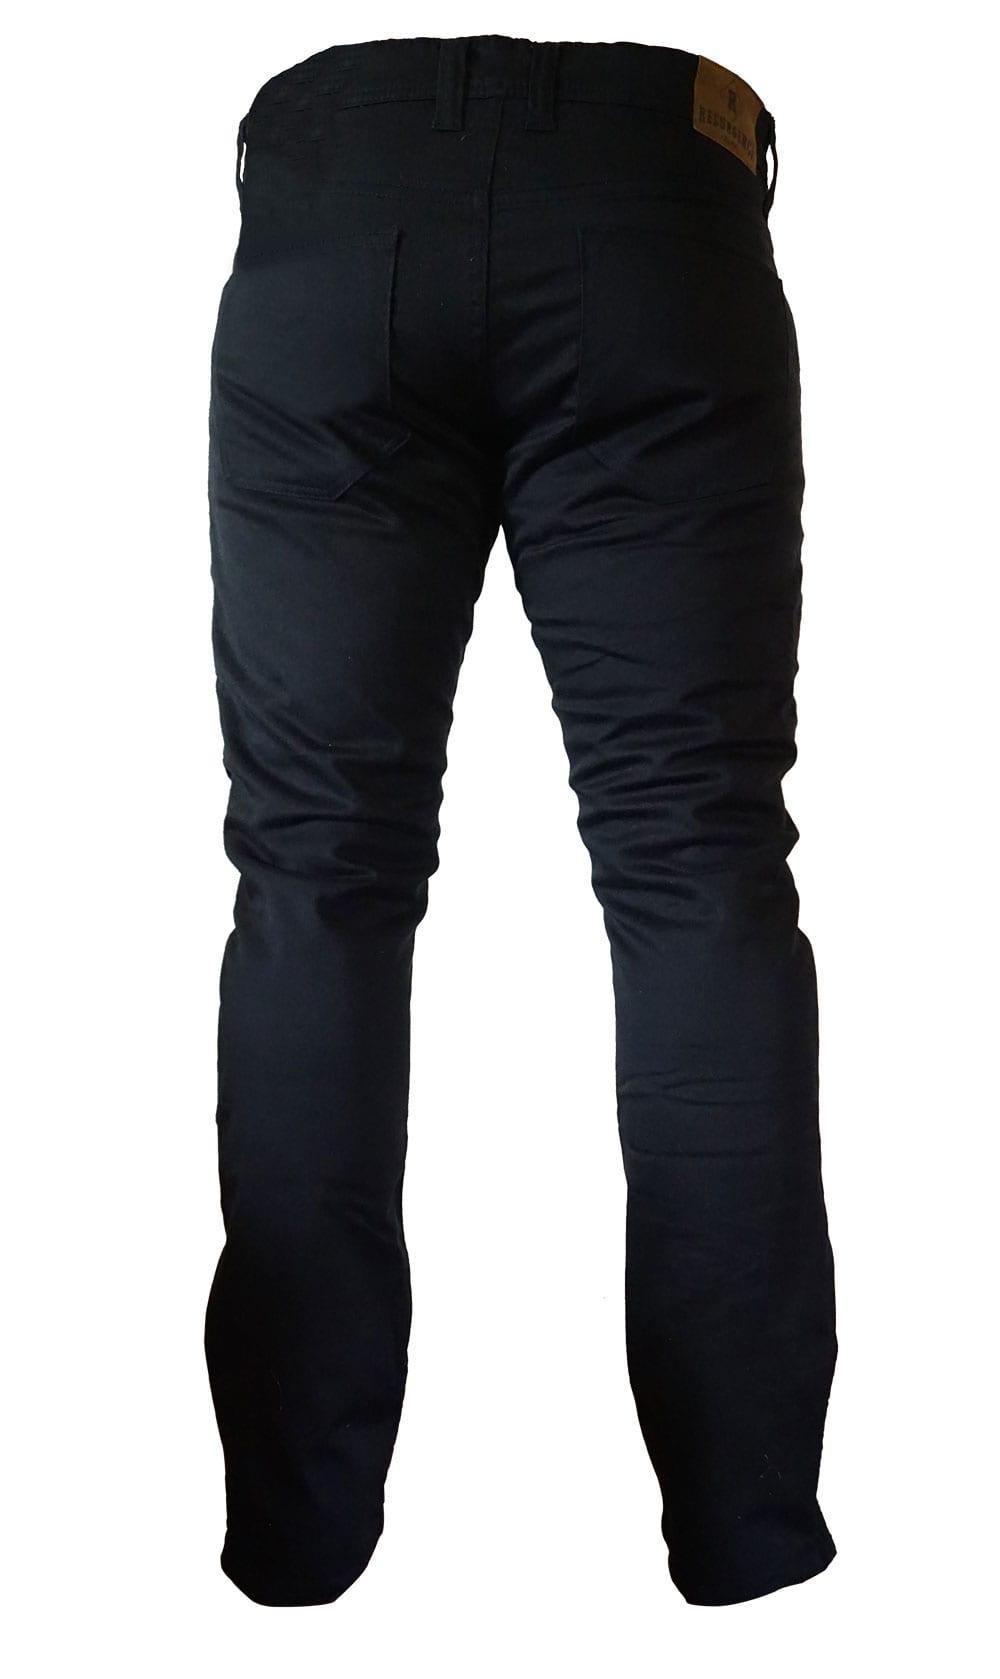 safest motorcycle jeans